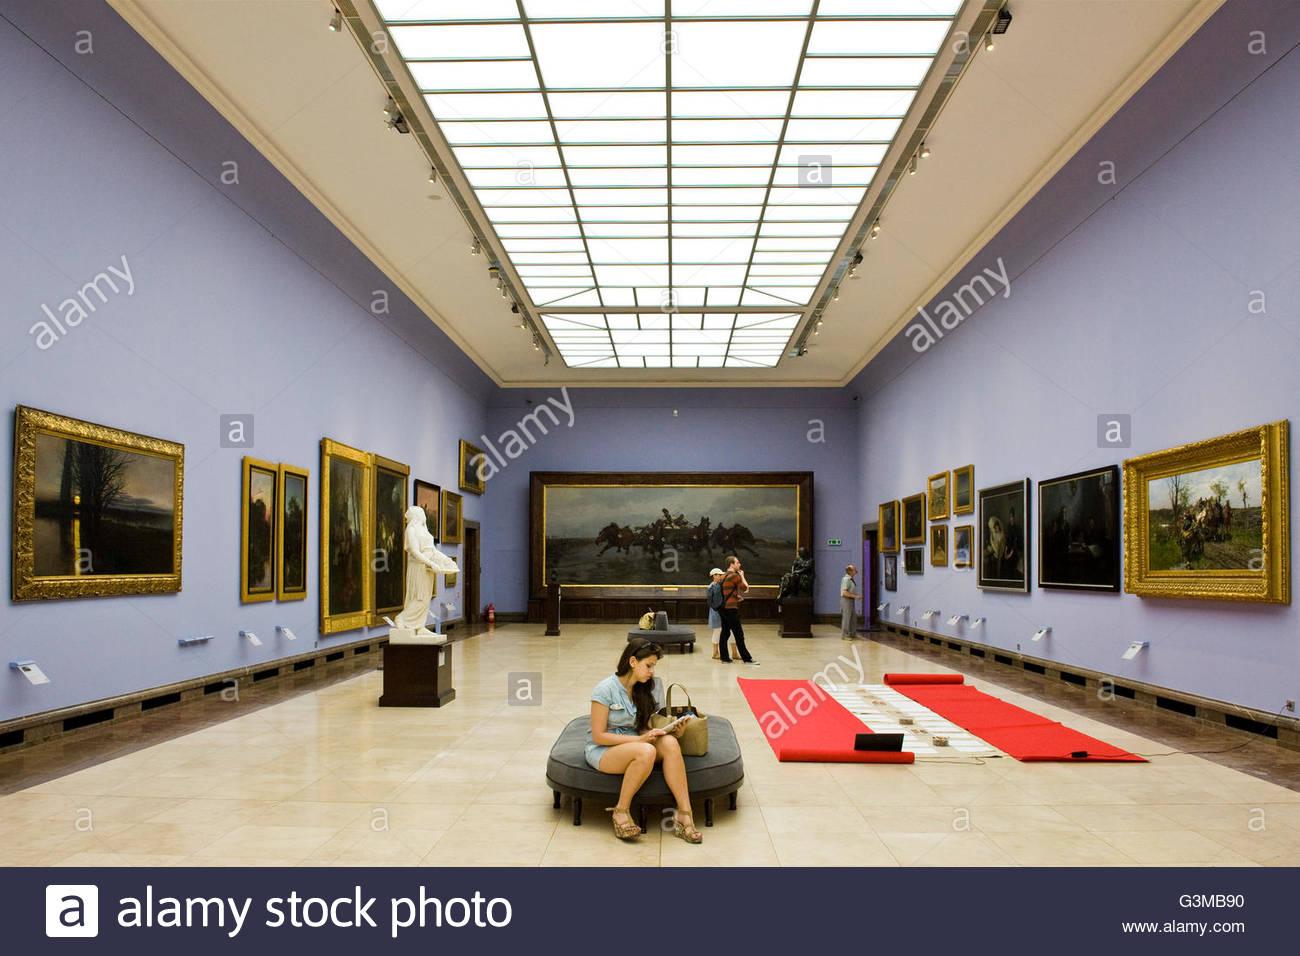 Poland,Krakow,Gallery of 19th Century Polish Art - Stock Image